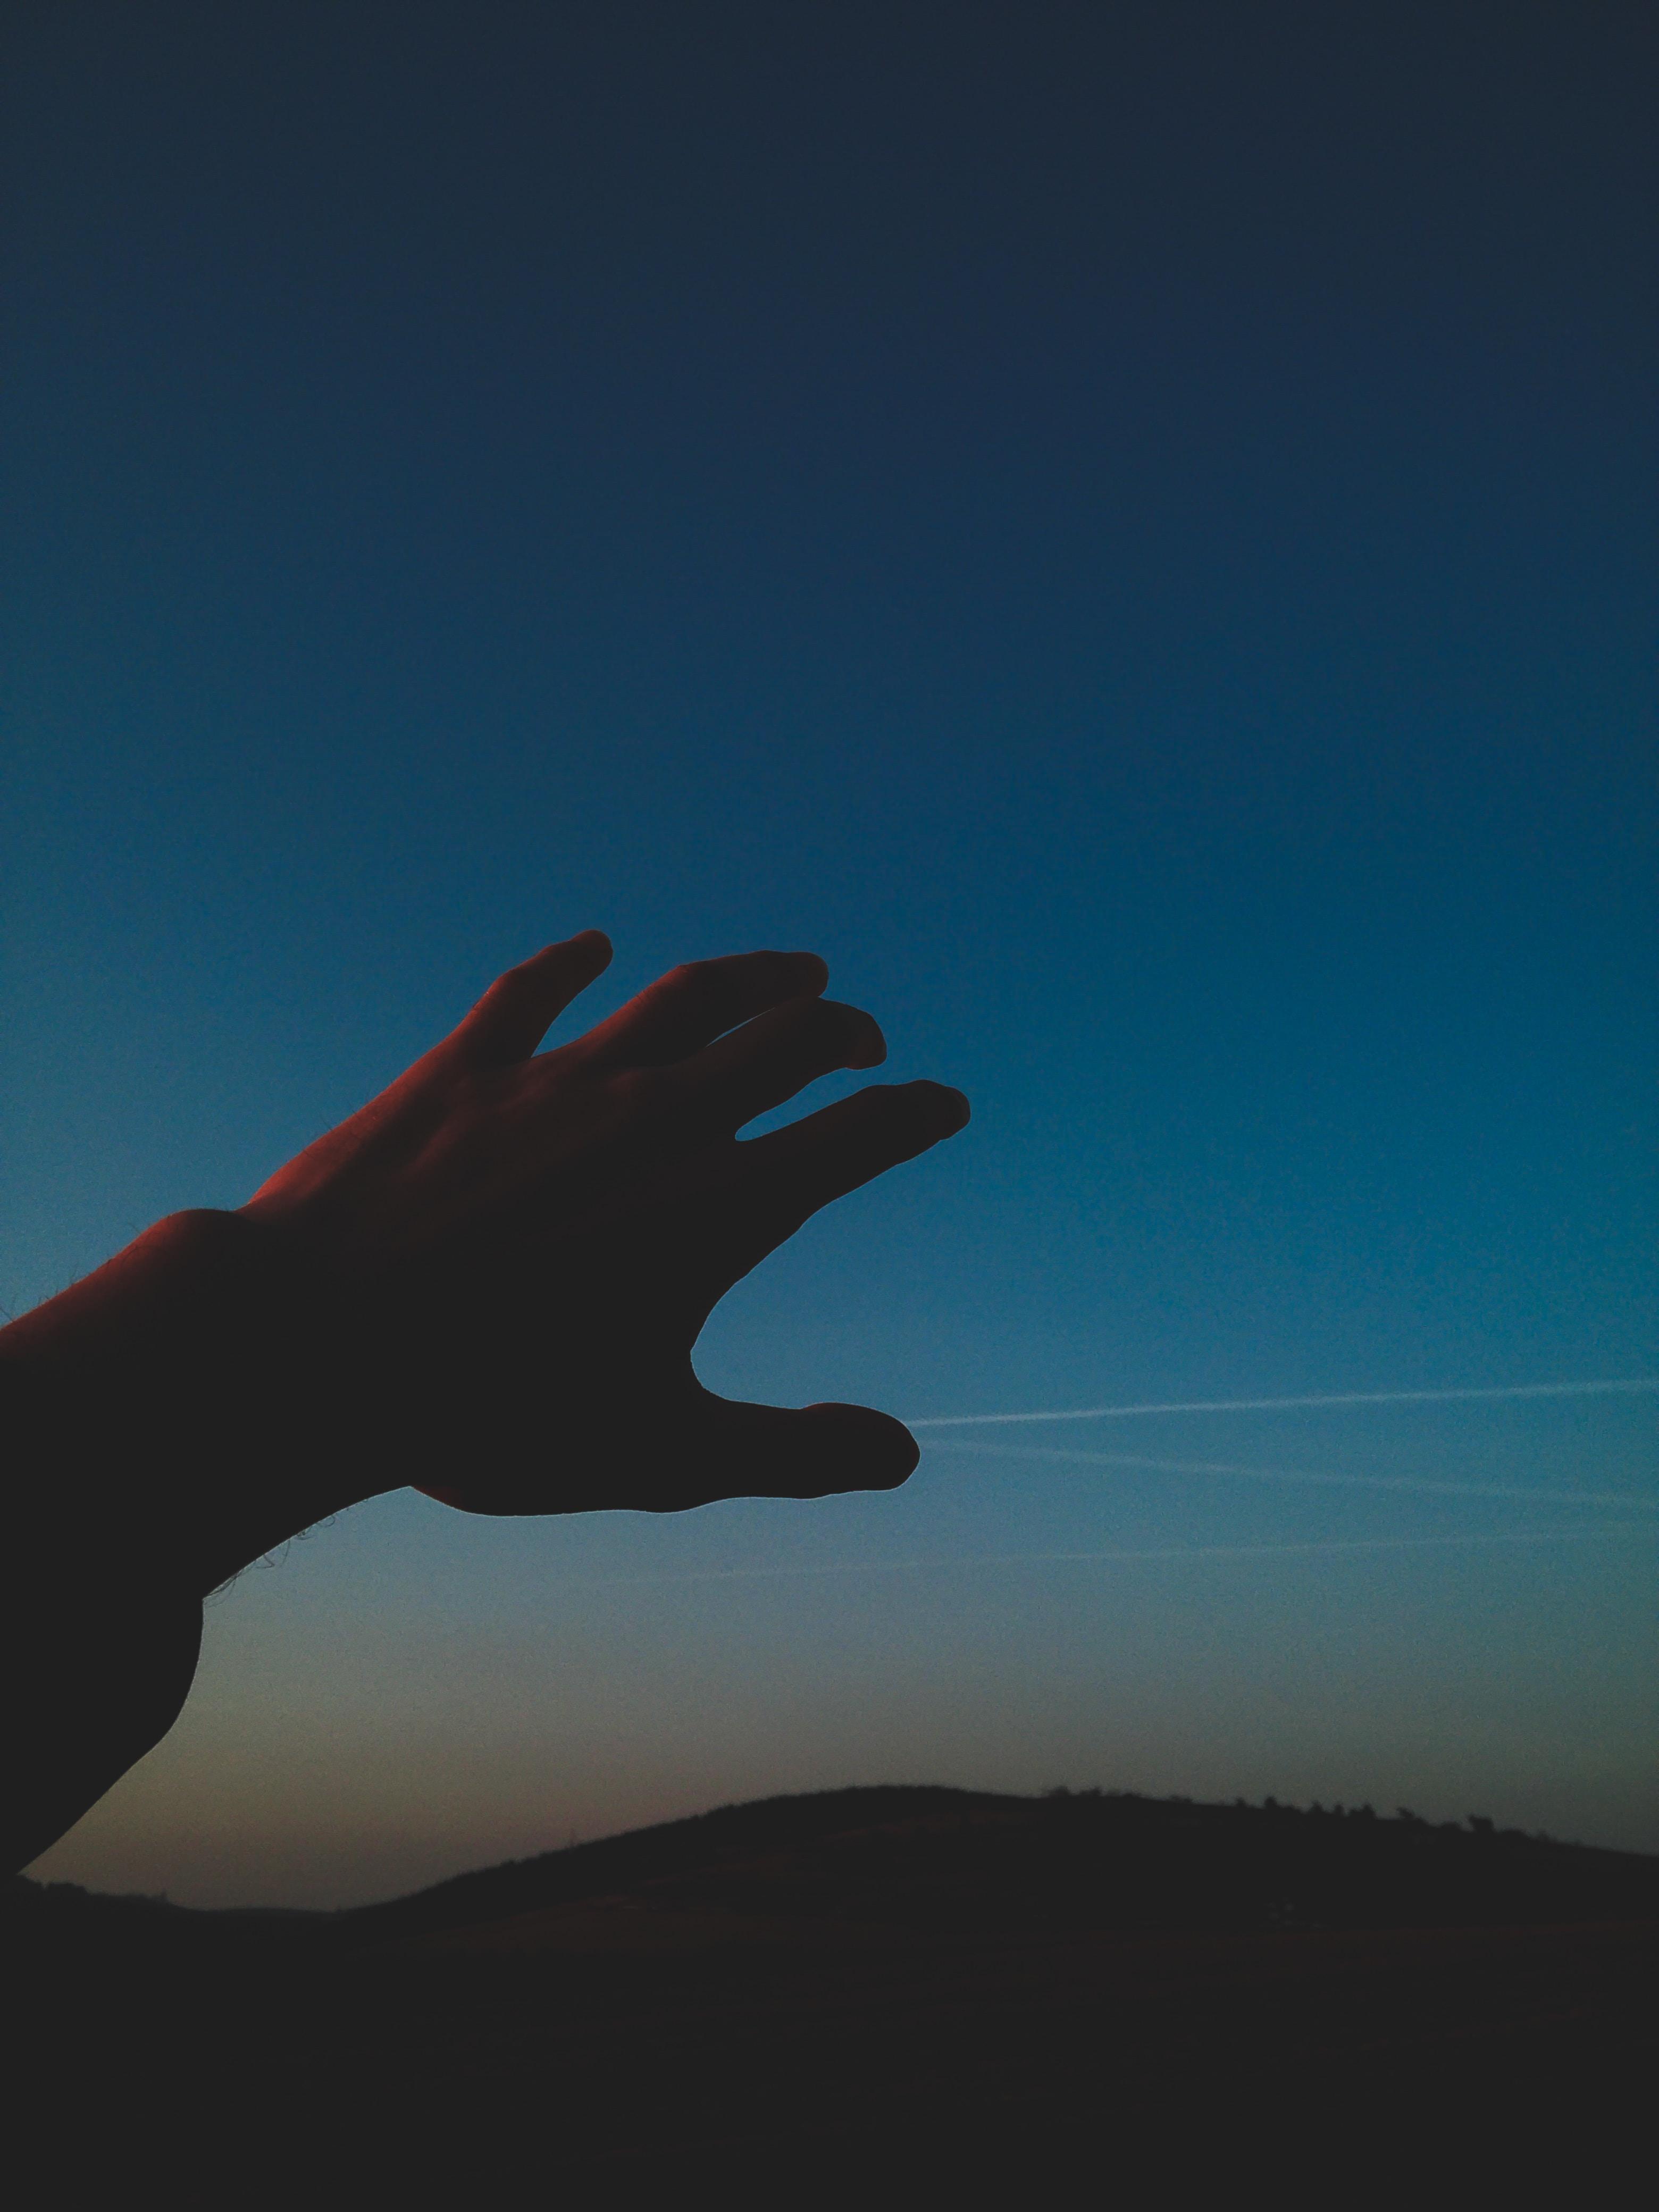 person raising hand on sky